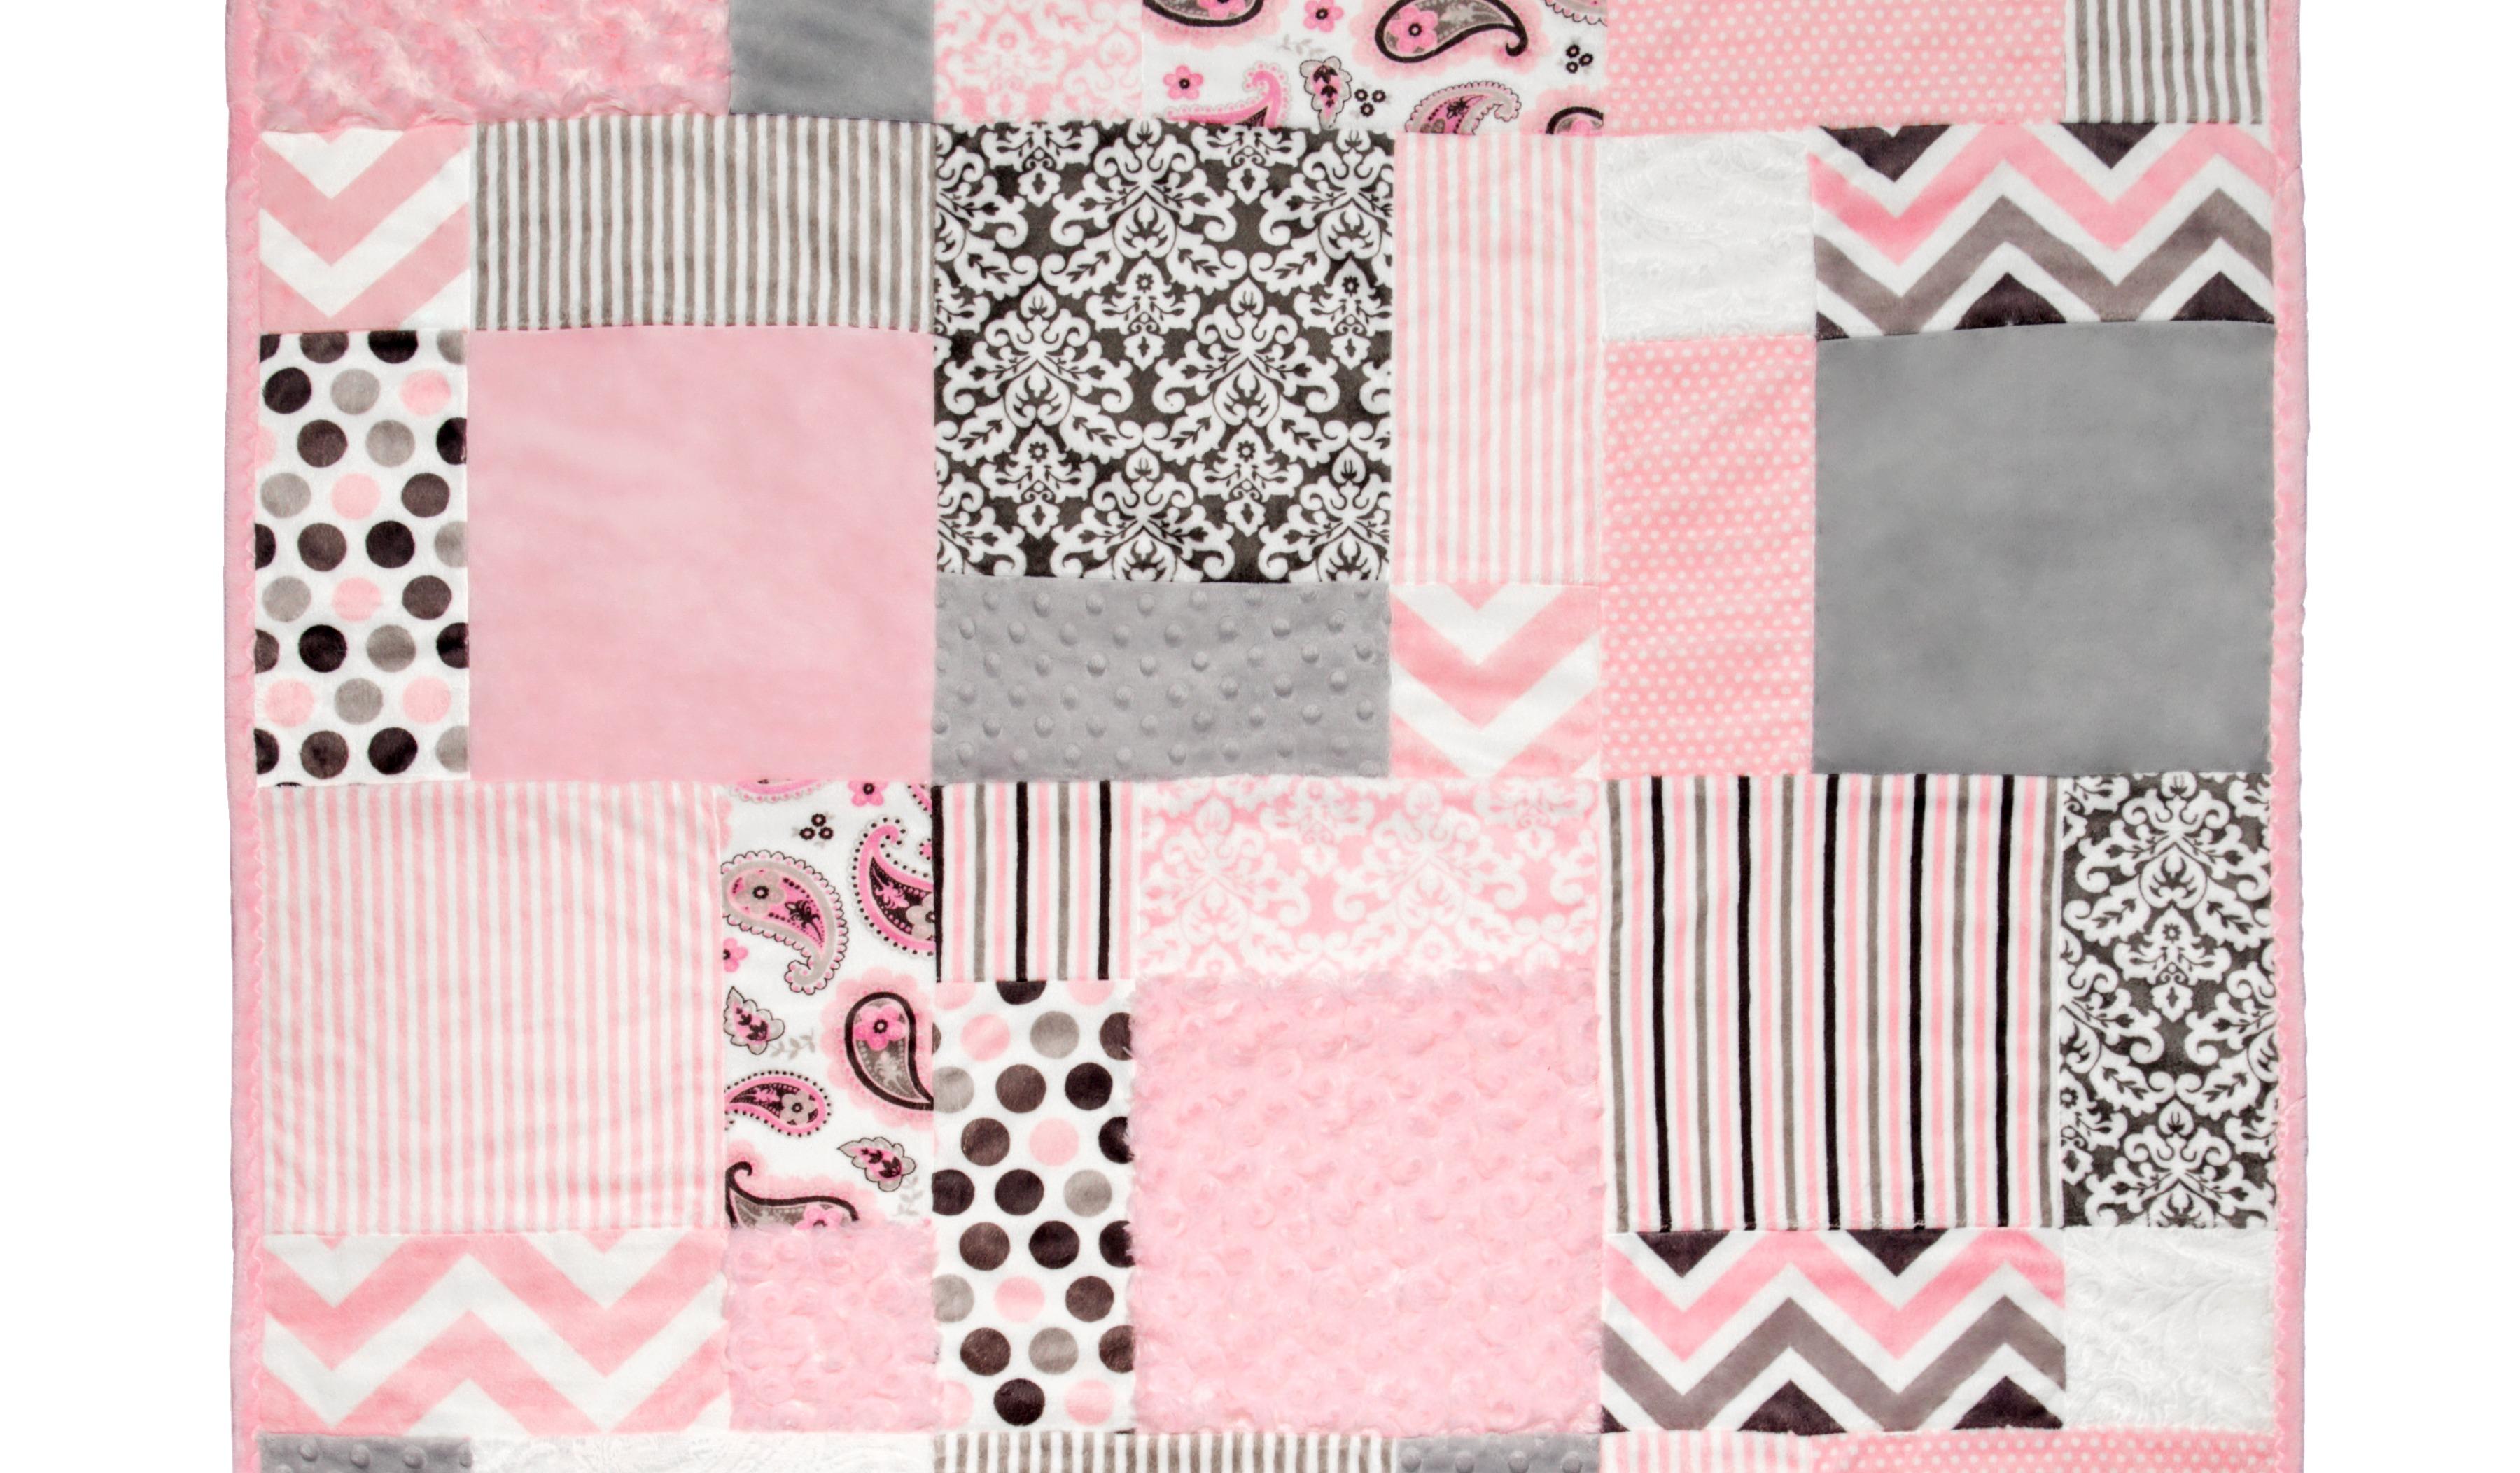 Block 1 of Sugar /& Spice Paper Dolls Quilt Sleepy Times PJs Pattern